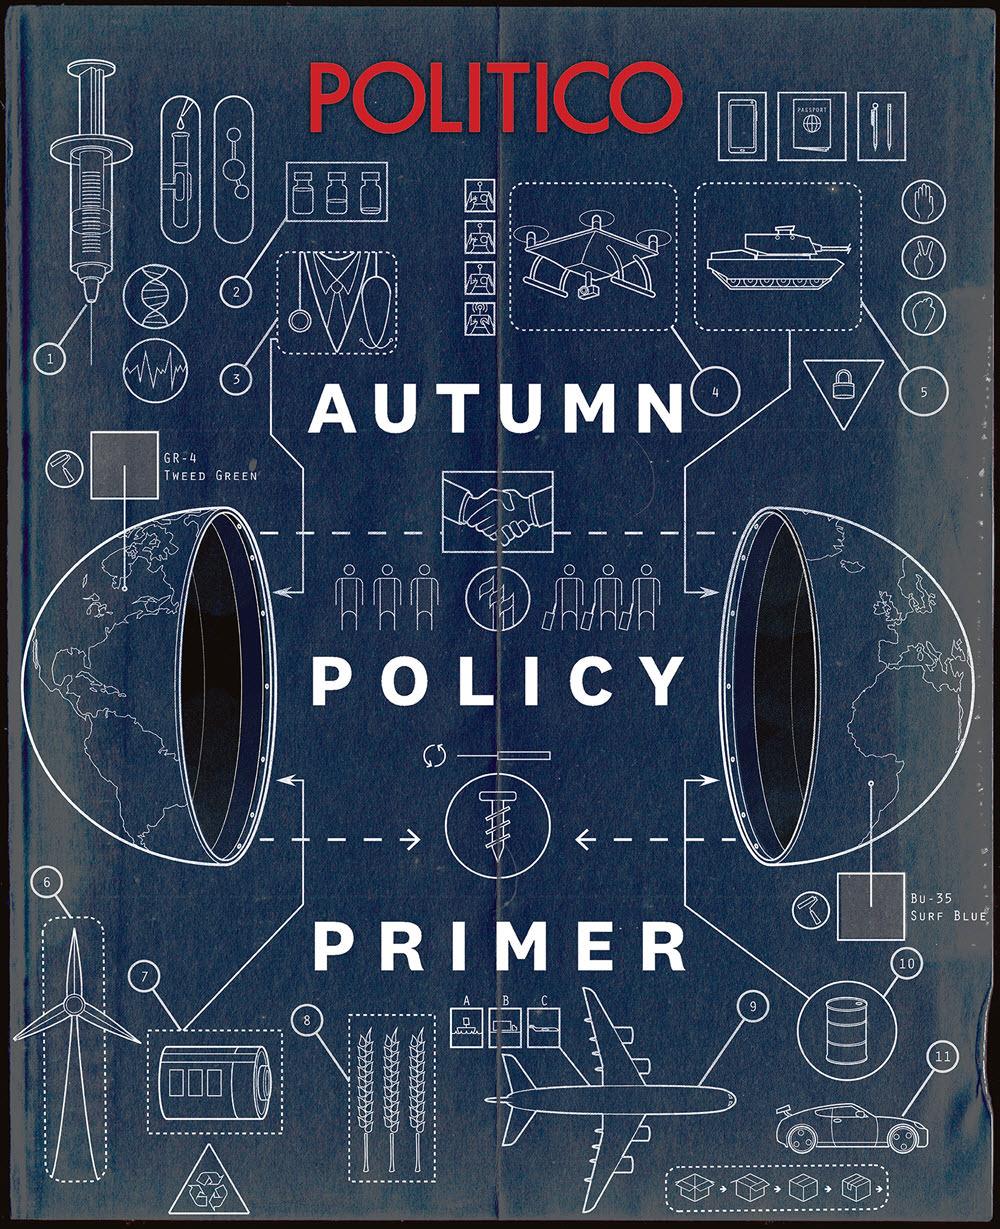 Policy Primer - RG182a